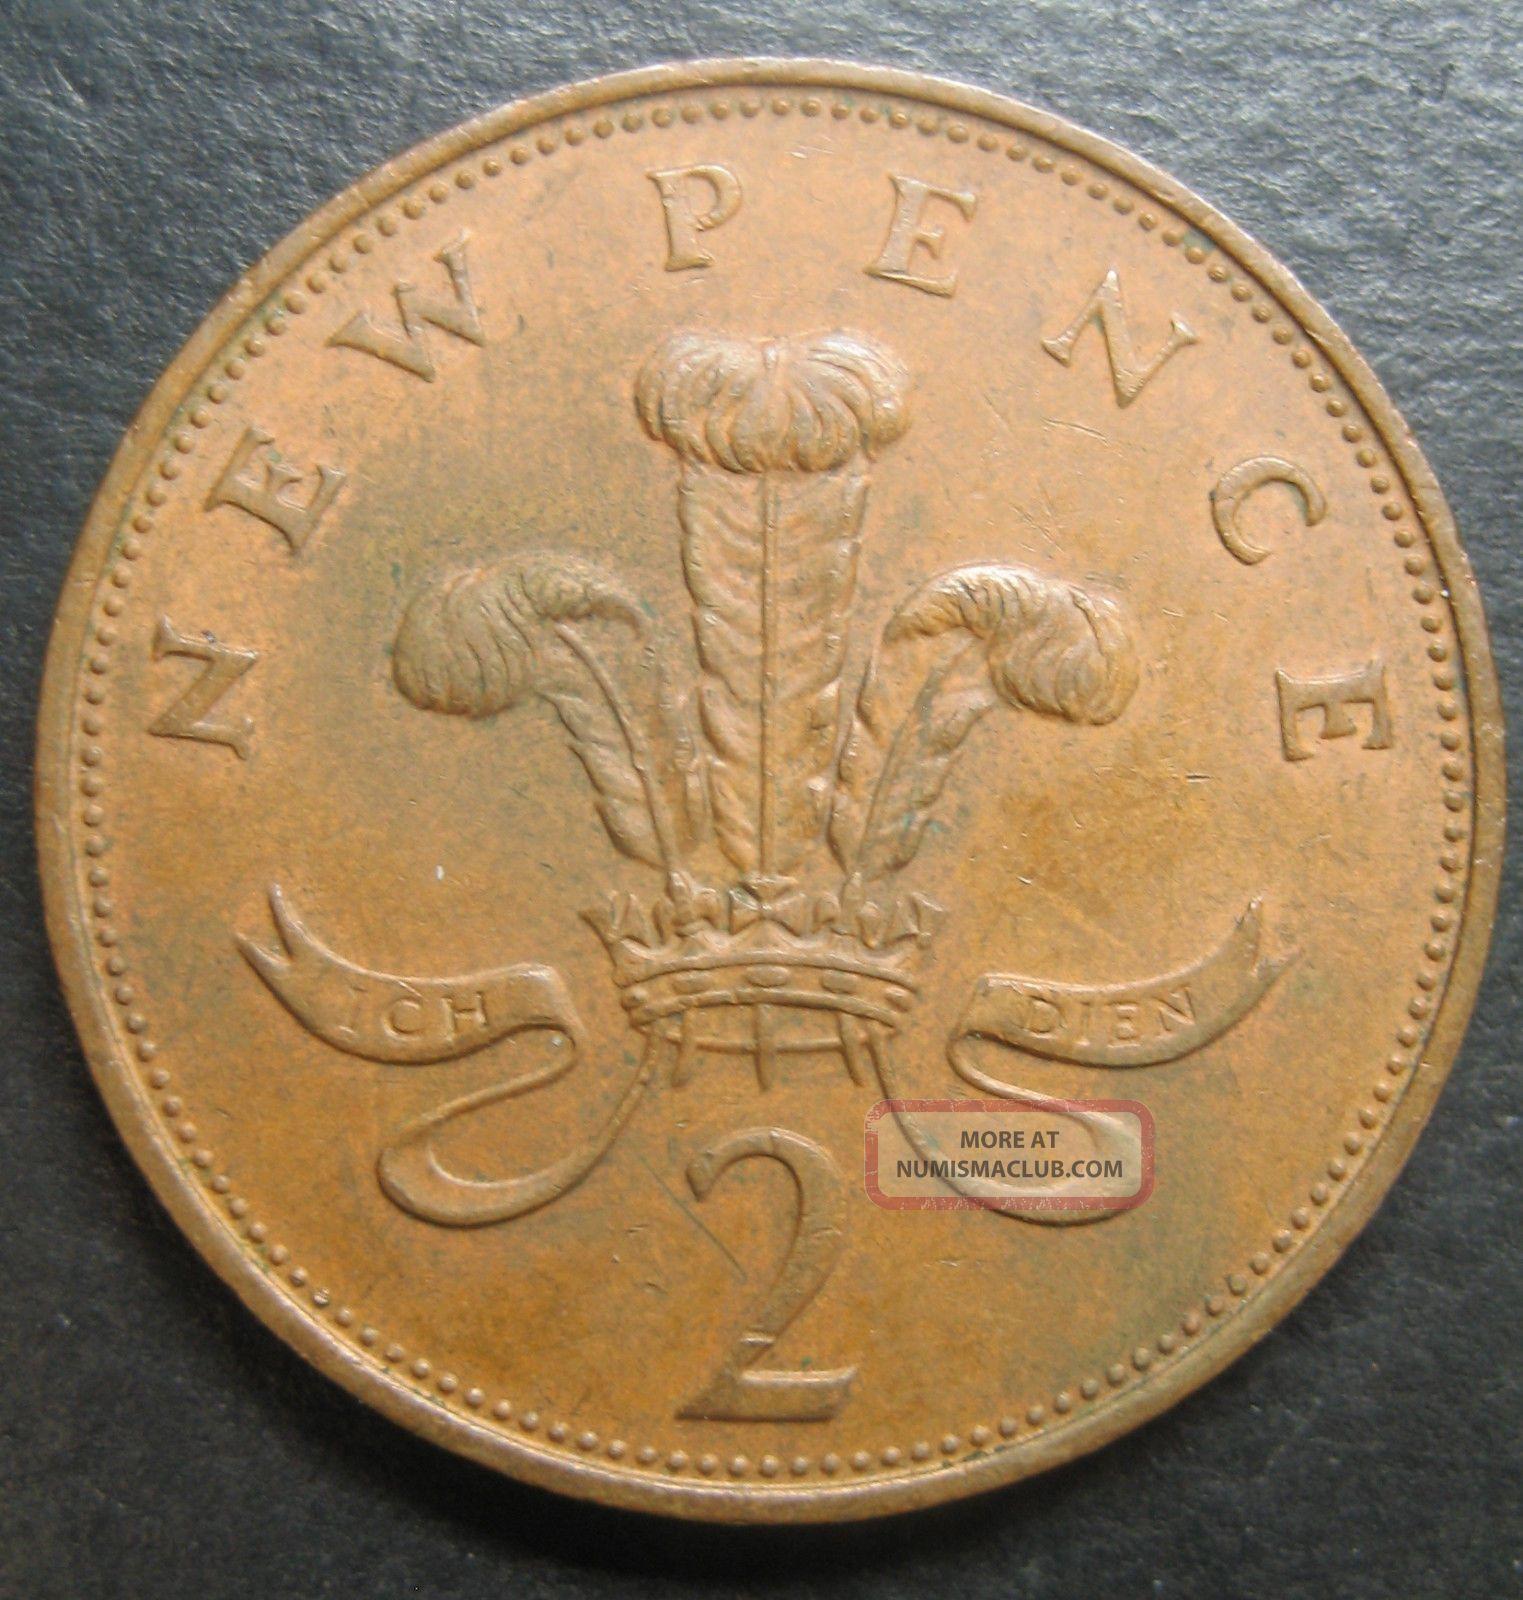 1971 Great Britain 2 Pence Decimal Coinfree UK (Great Britain) photo